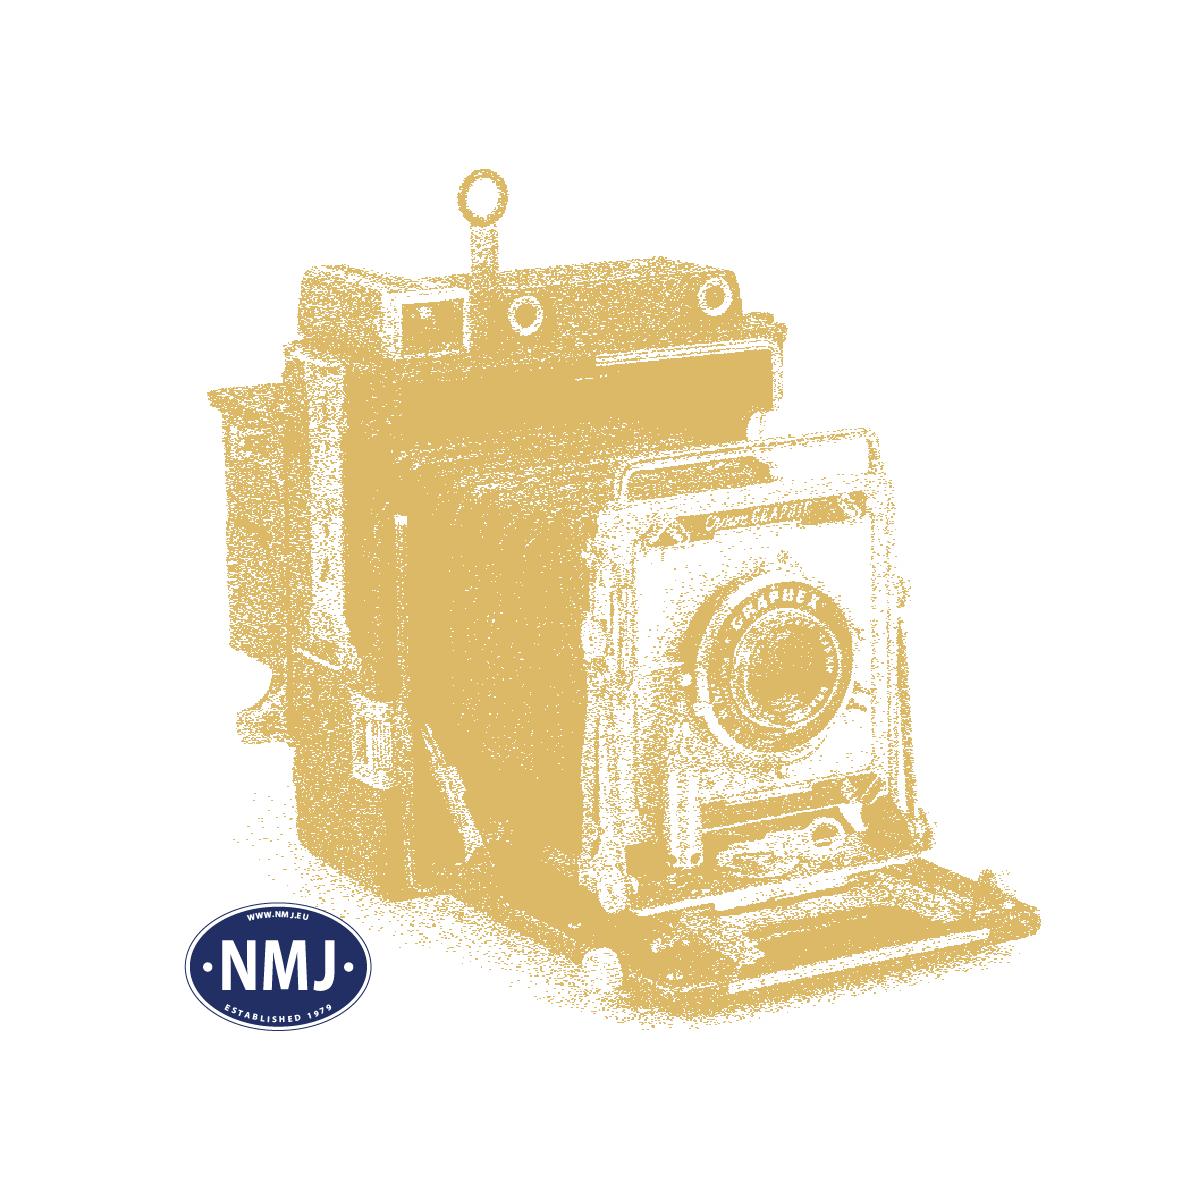 NMJ Topline NSB SKD224.222, Rødbrun, DCC Digital